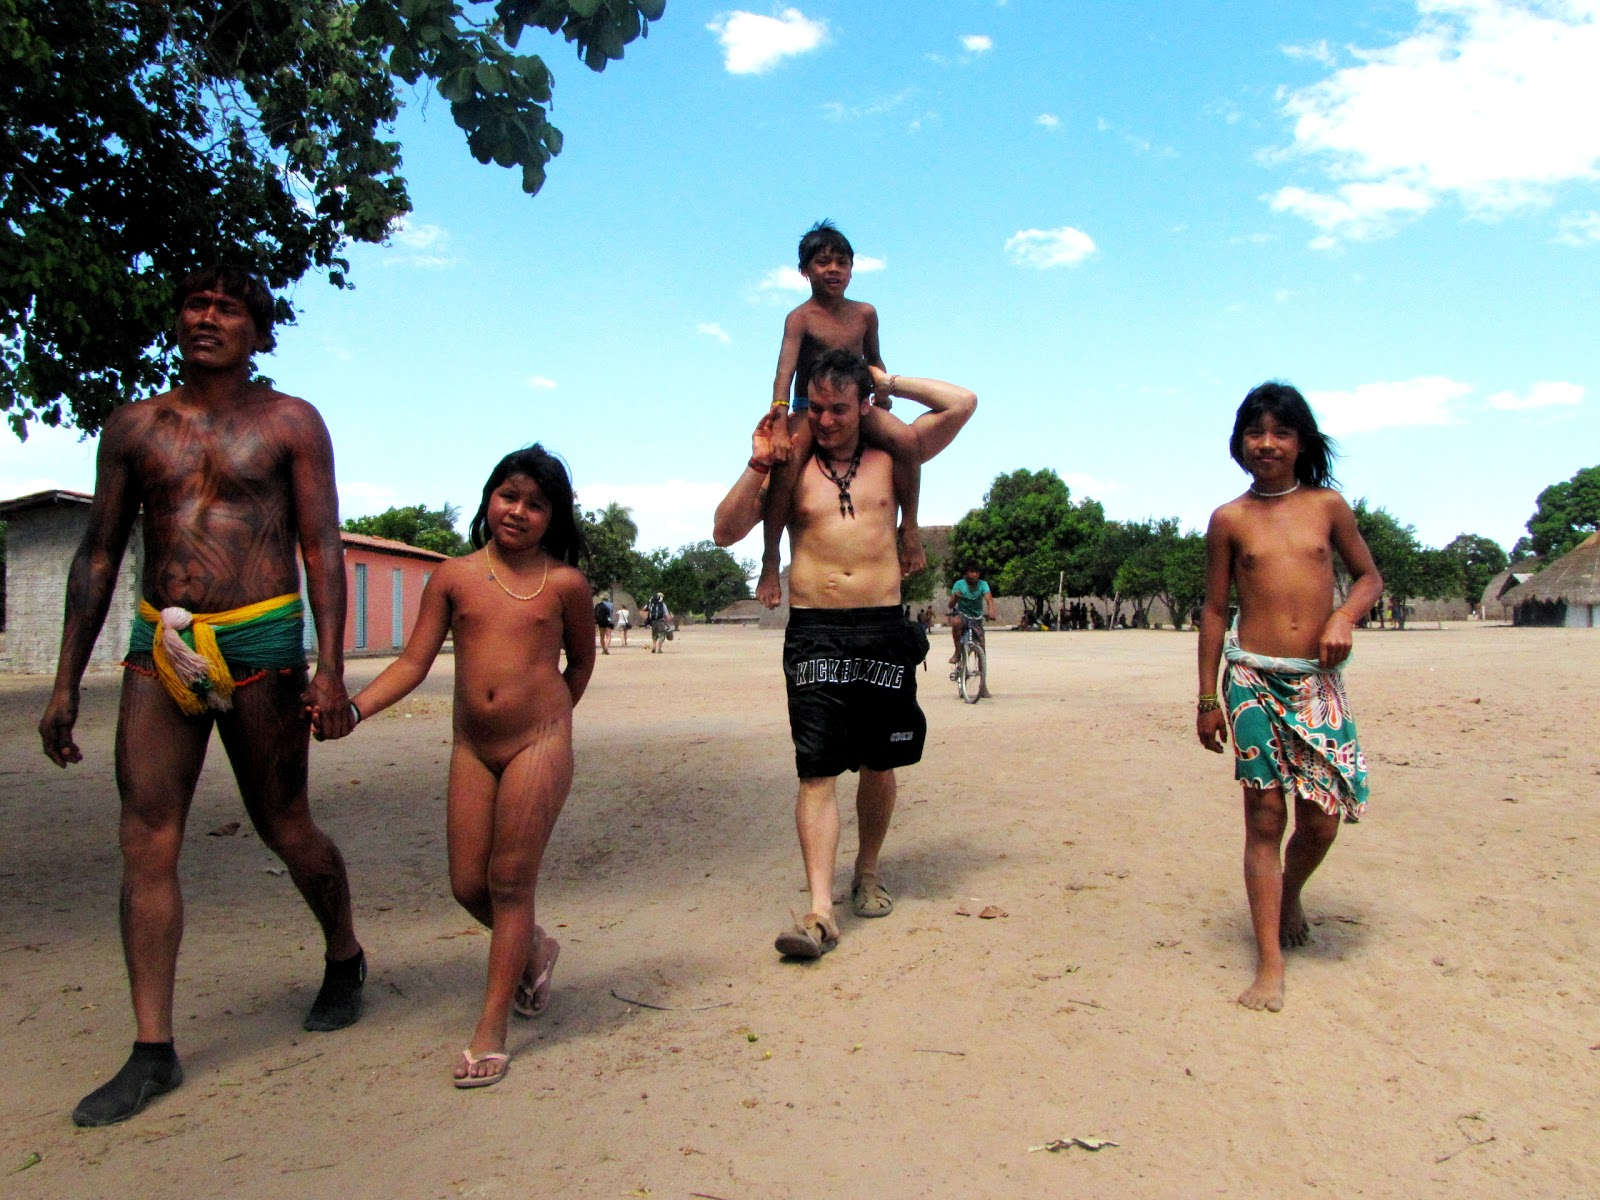 amazon jungle tribes girls nudes